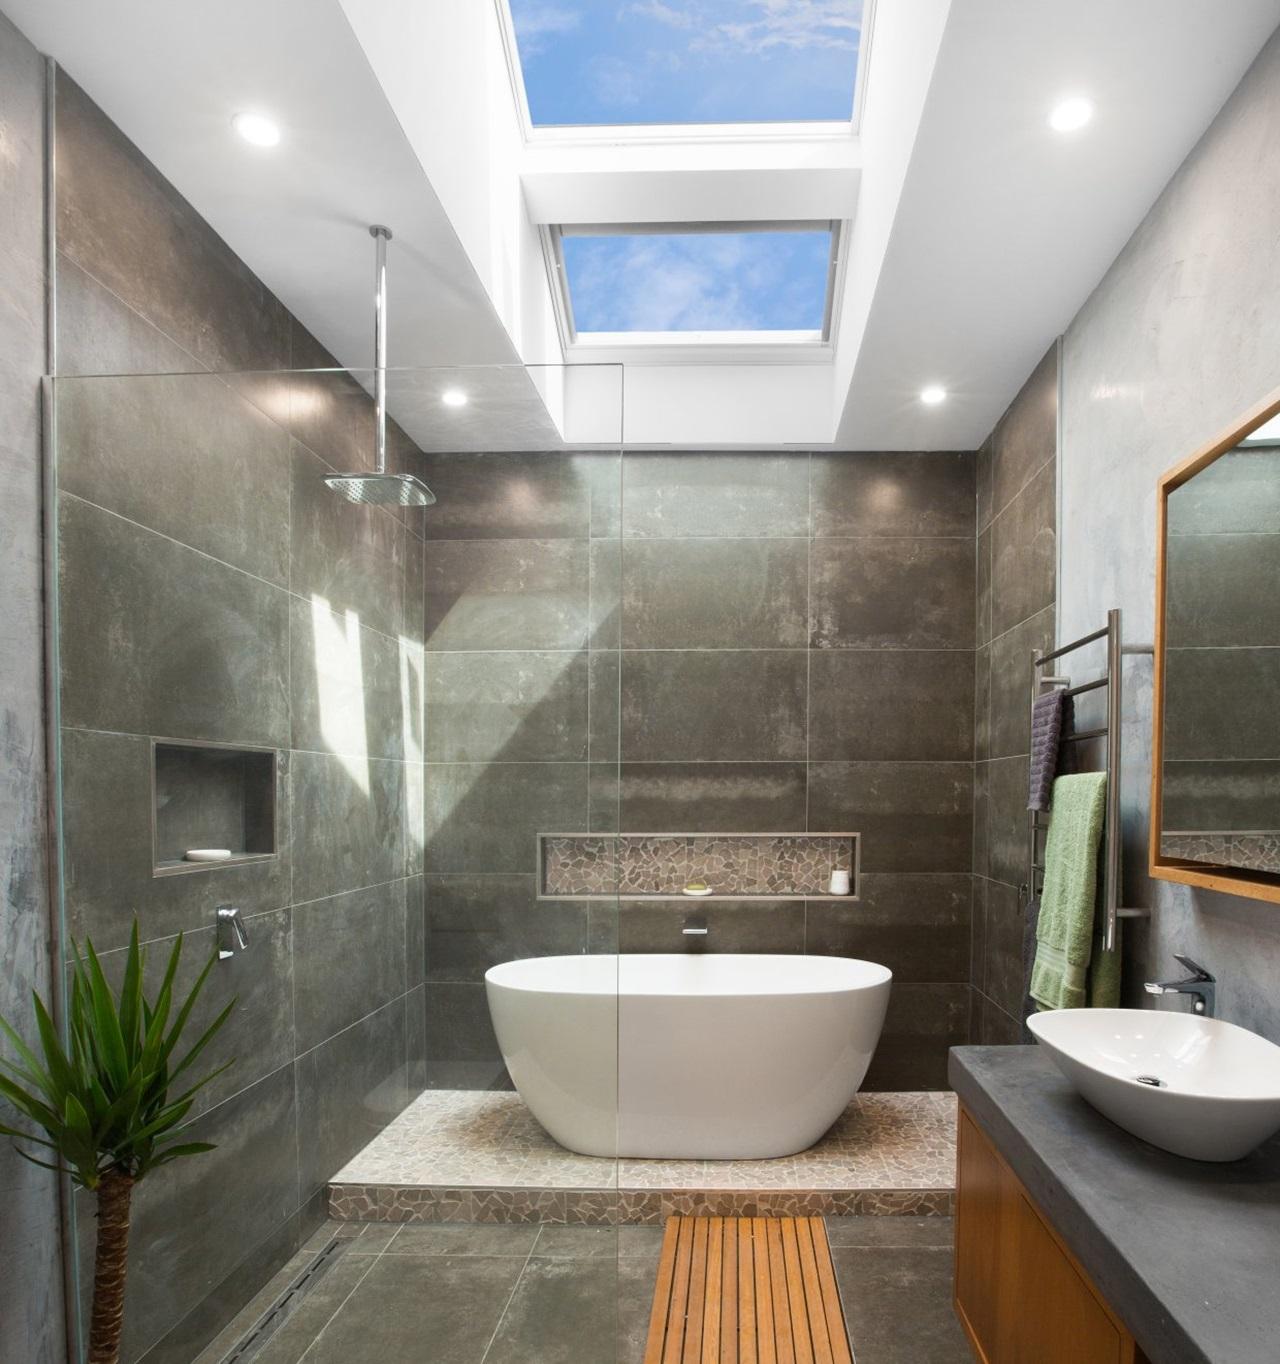 Bathroom Gallery – Skylight in Bathroom